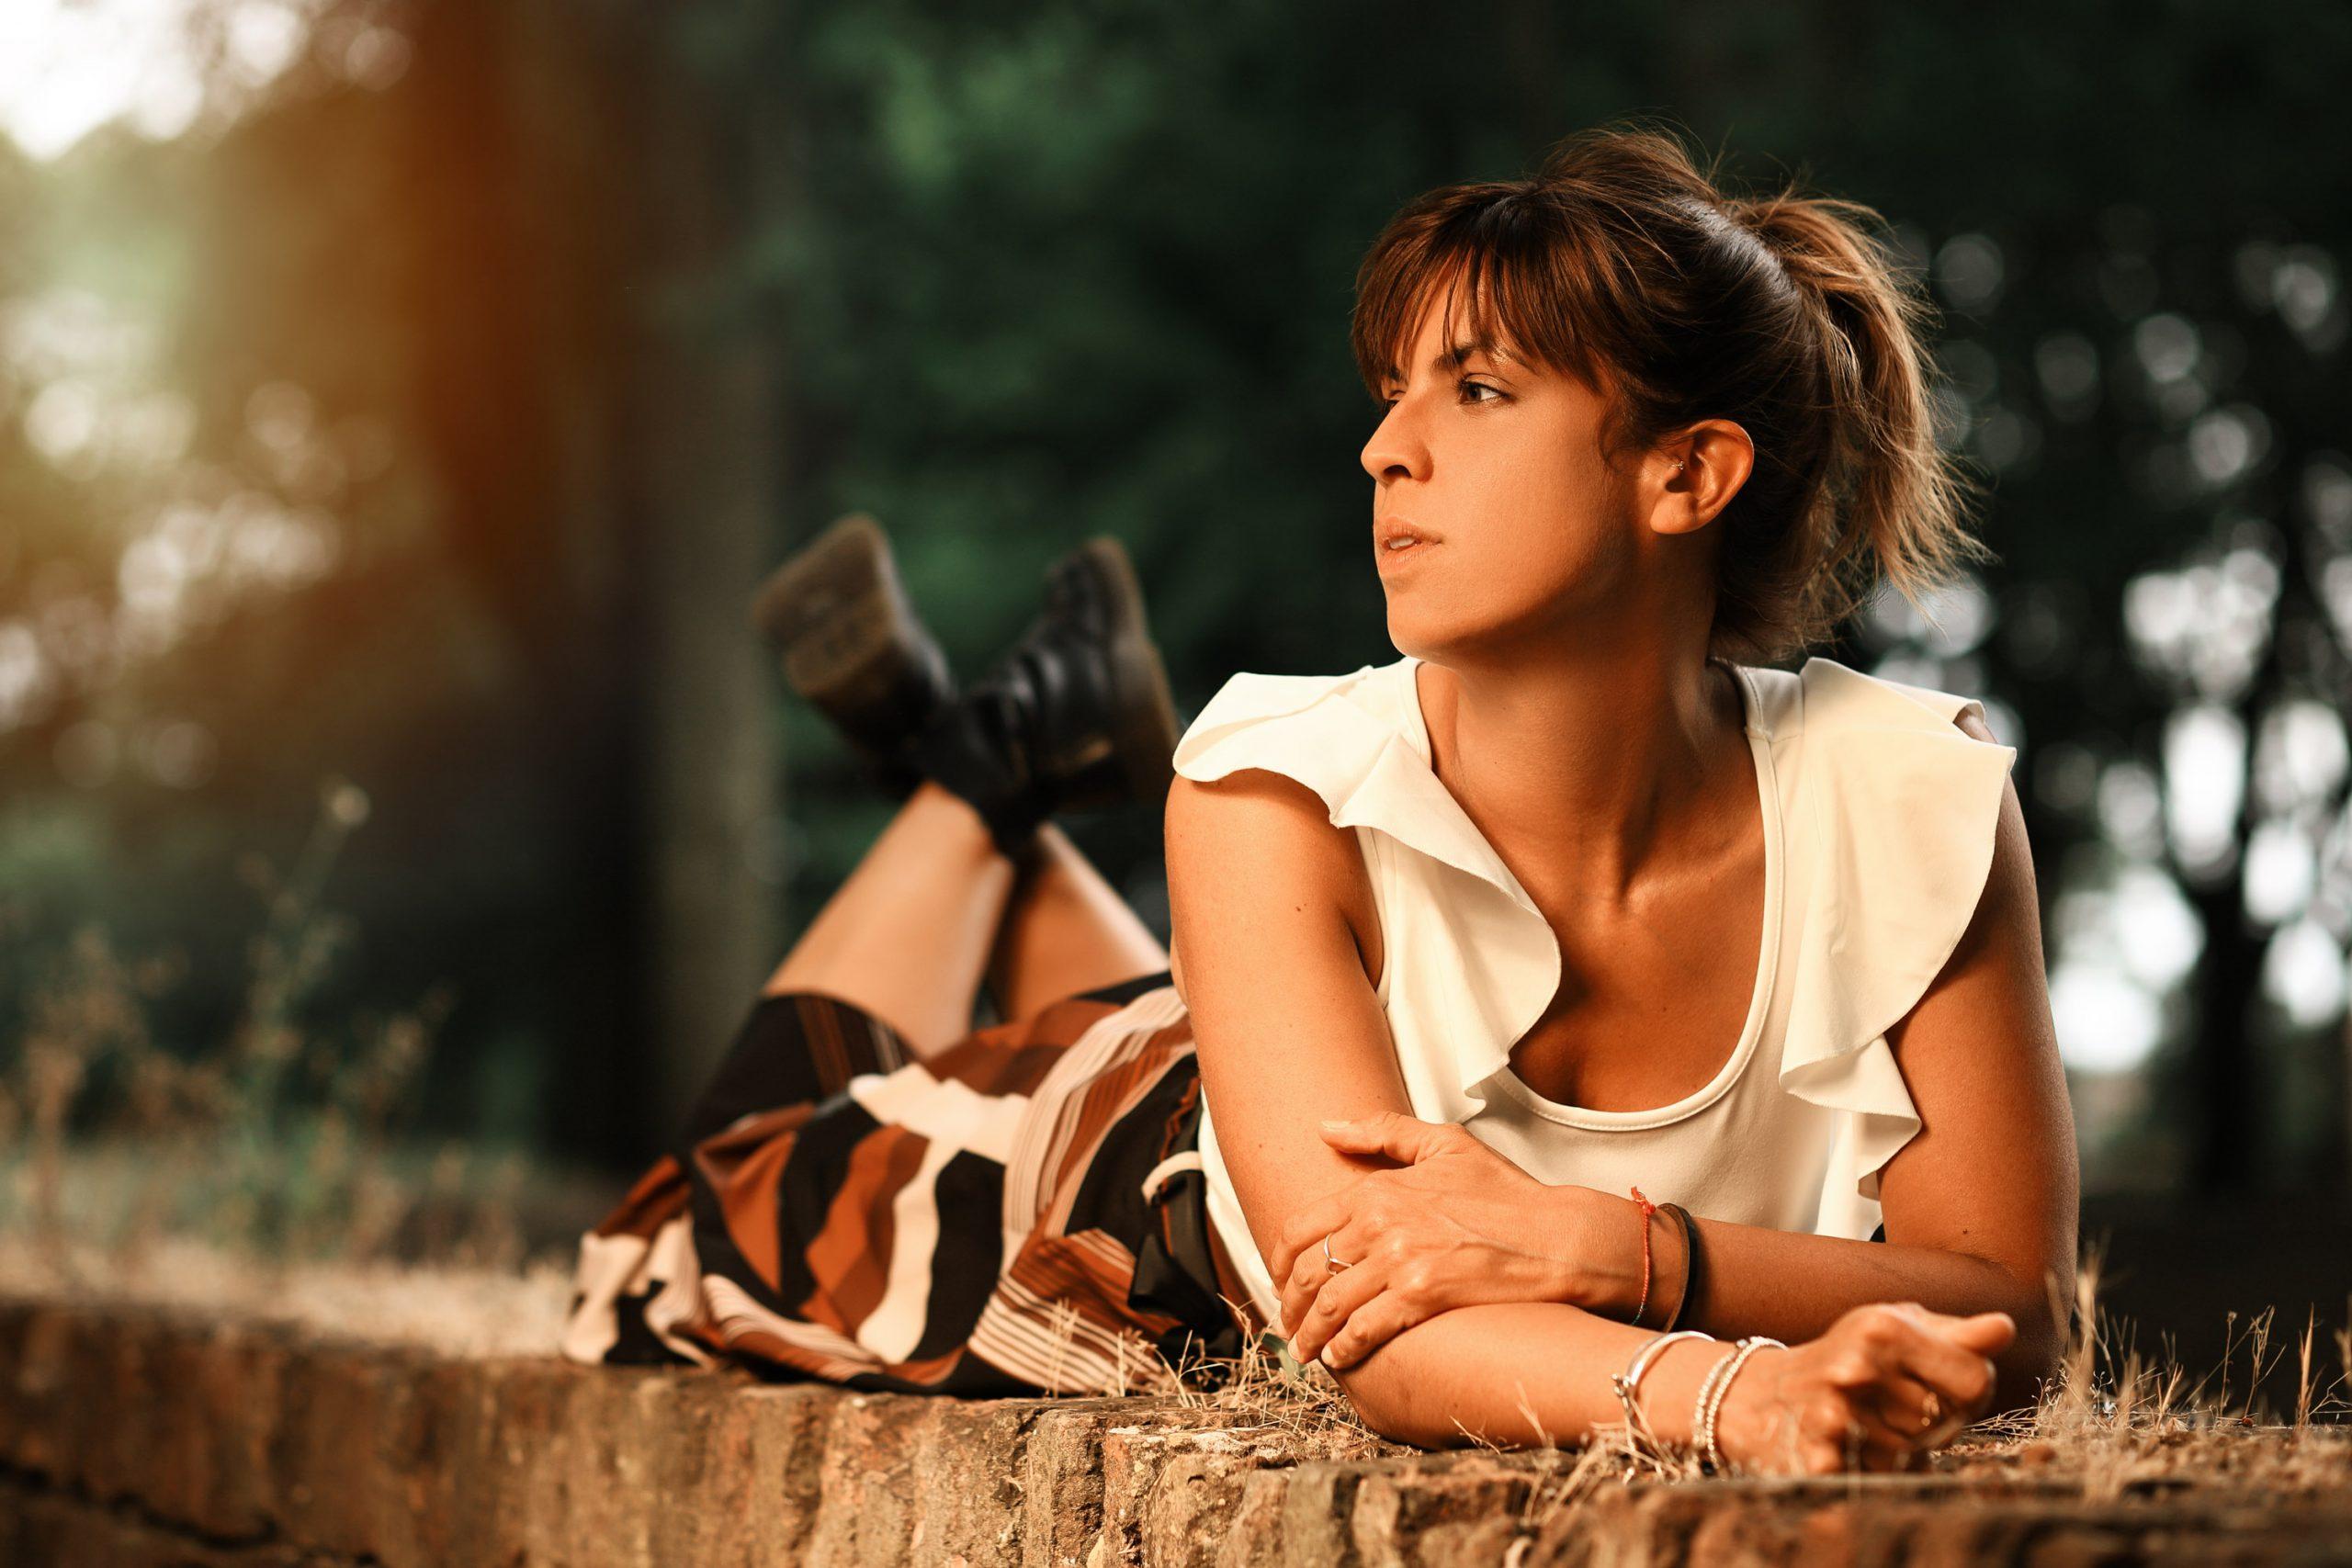 Categorie: Fashion, Fine Art, Glamour, Portrait; Photographer: LUCA BARTOLI (ElleBierre photographer); Model: ALICE FERRARI; Location:Ferrara, FE, Italia